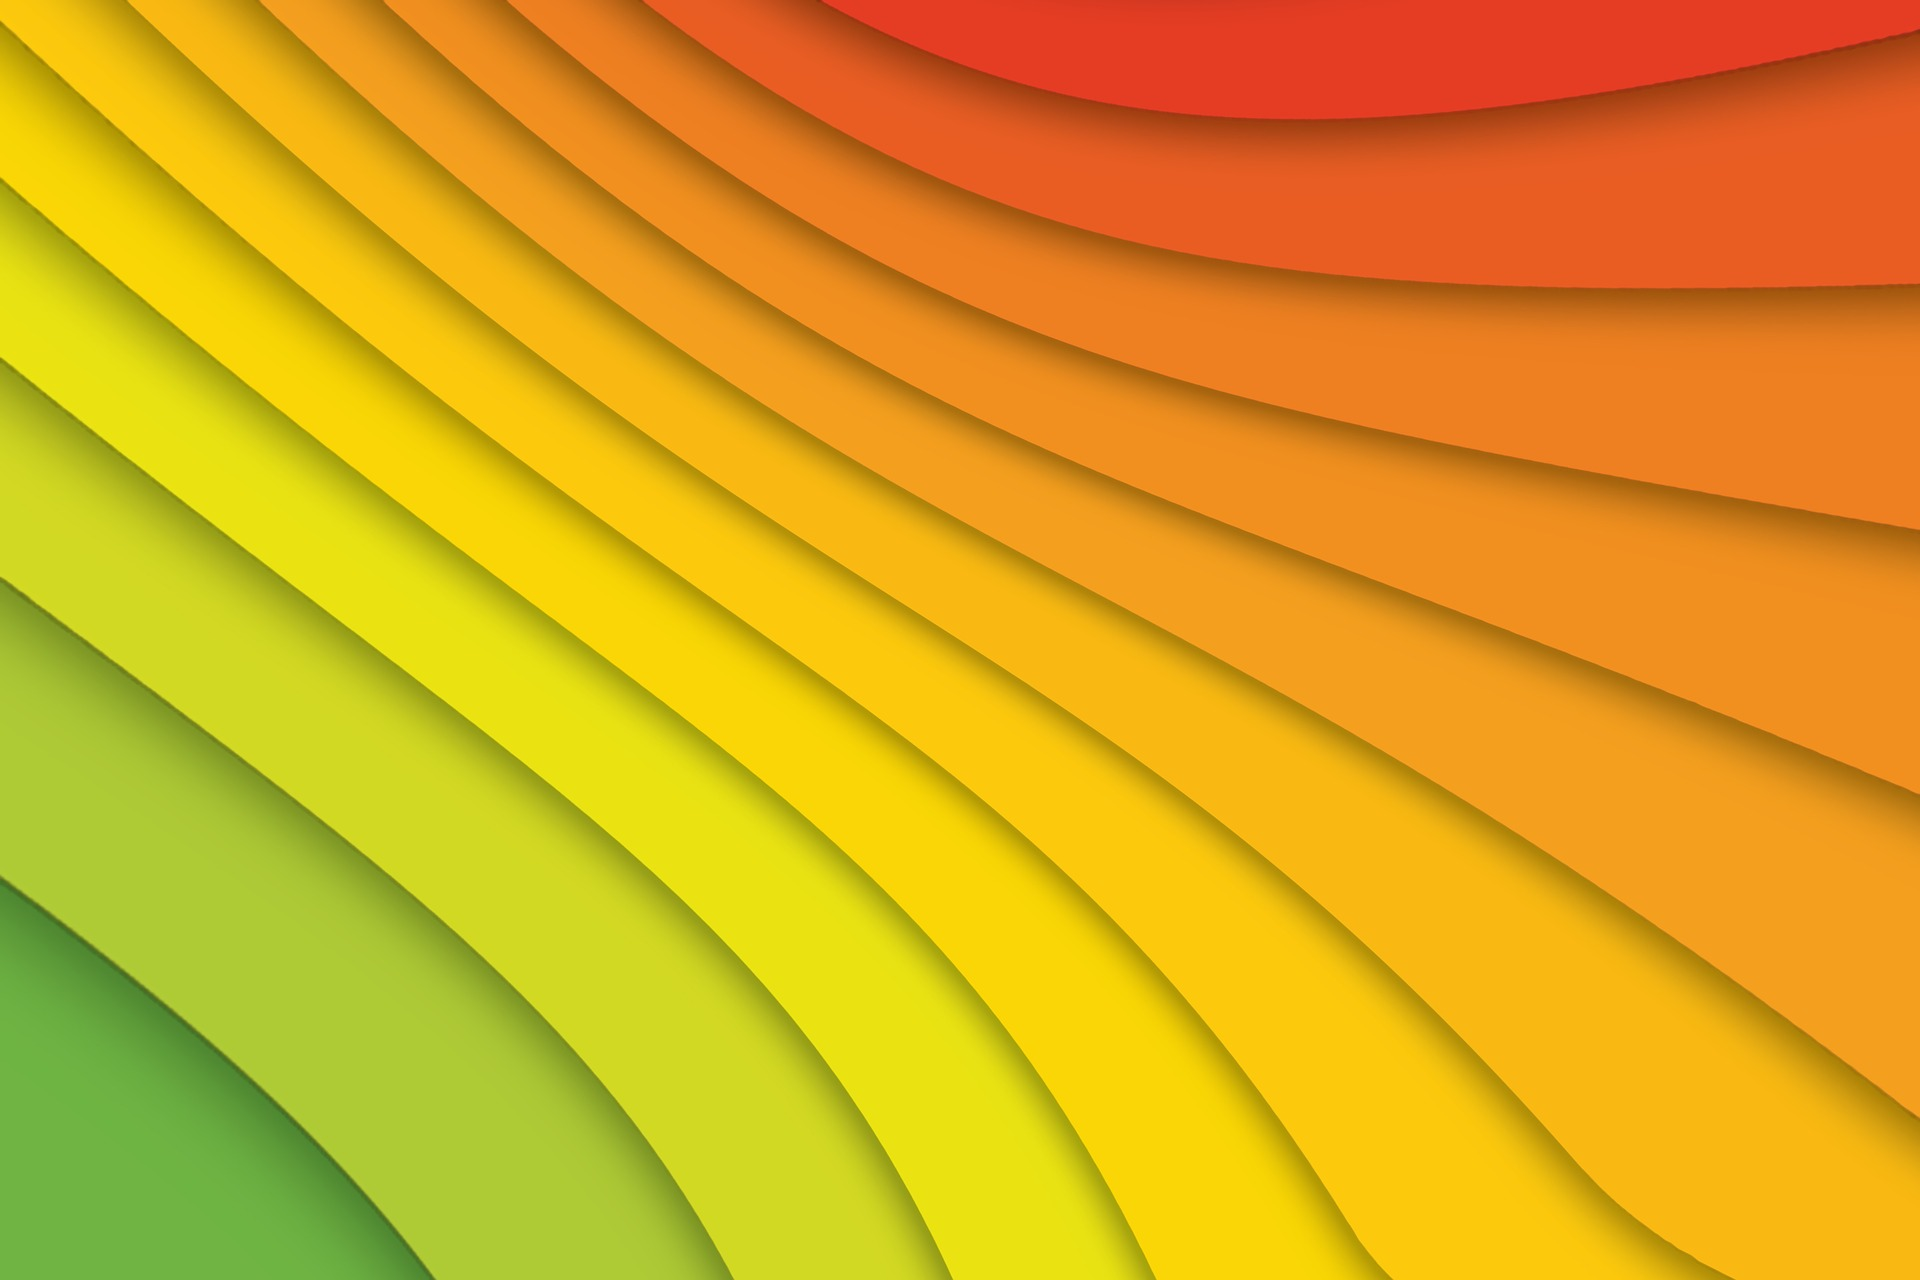 Muster, Linien, Farben, torsión, Ebenen - Wallpaper HD - Prof.-falken.com